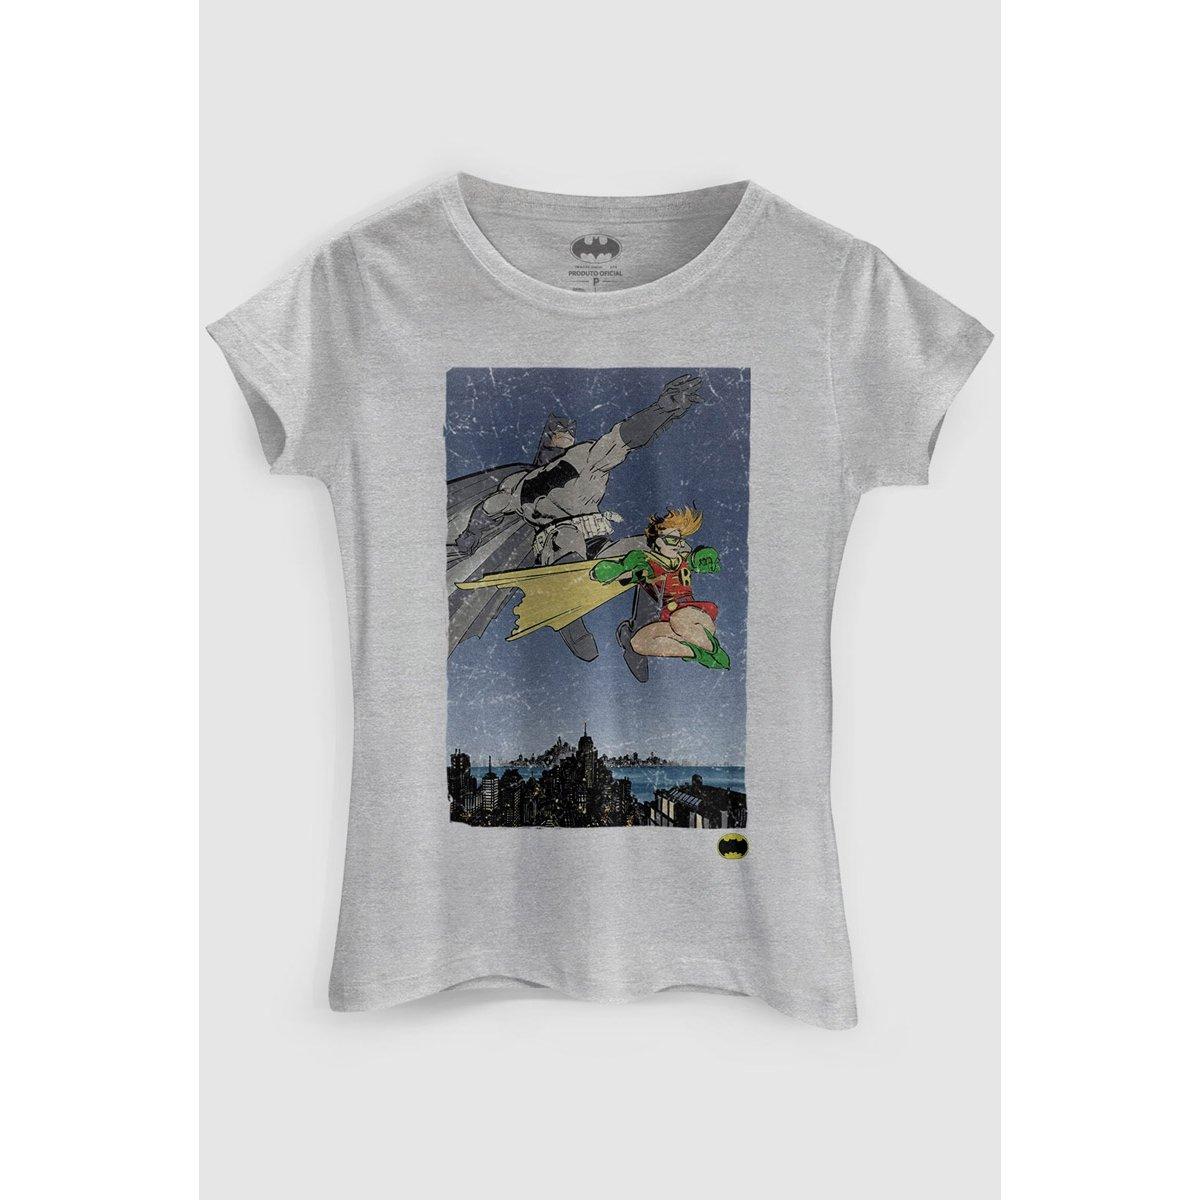 bandUP Robin Cinza Batman Camiseta e DC Comics Batman Comics bandUP DC Camiseta Robin Cinza e Camiseta 4xCBgAqCw